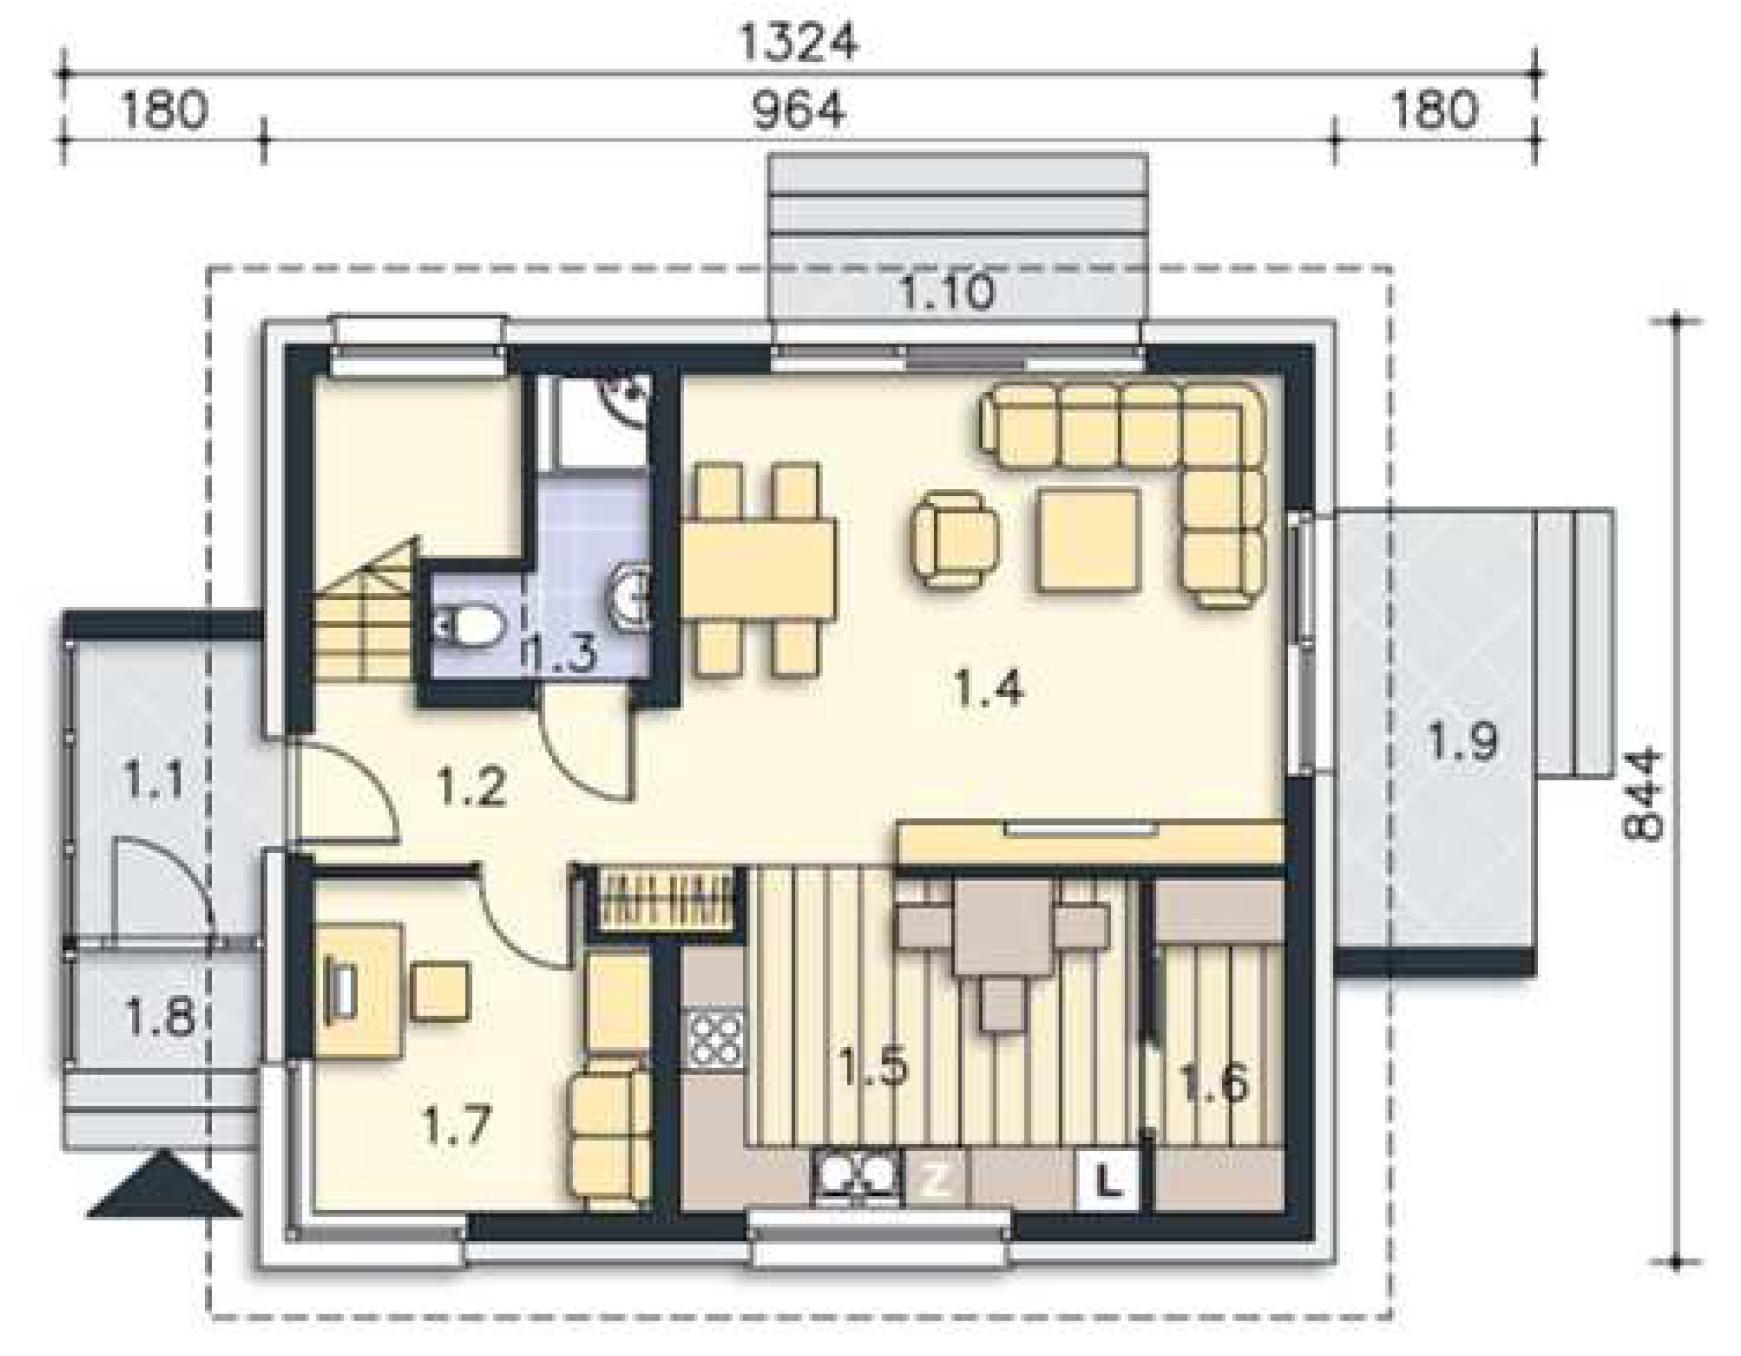 cef haus wastl 109 cmf creativ massiv flexibel hausbau gmbh. Black Bedroom Furniture Sets. Home Design Ideas